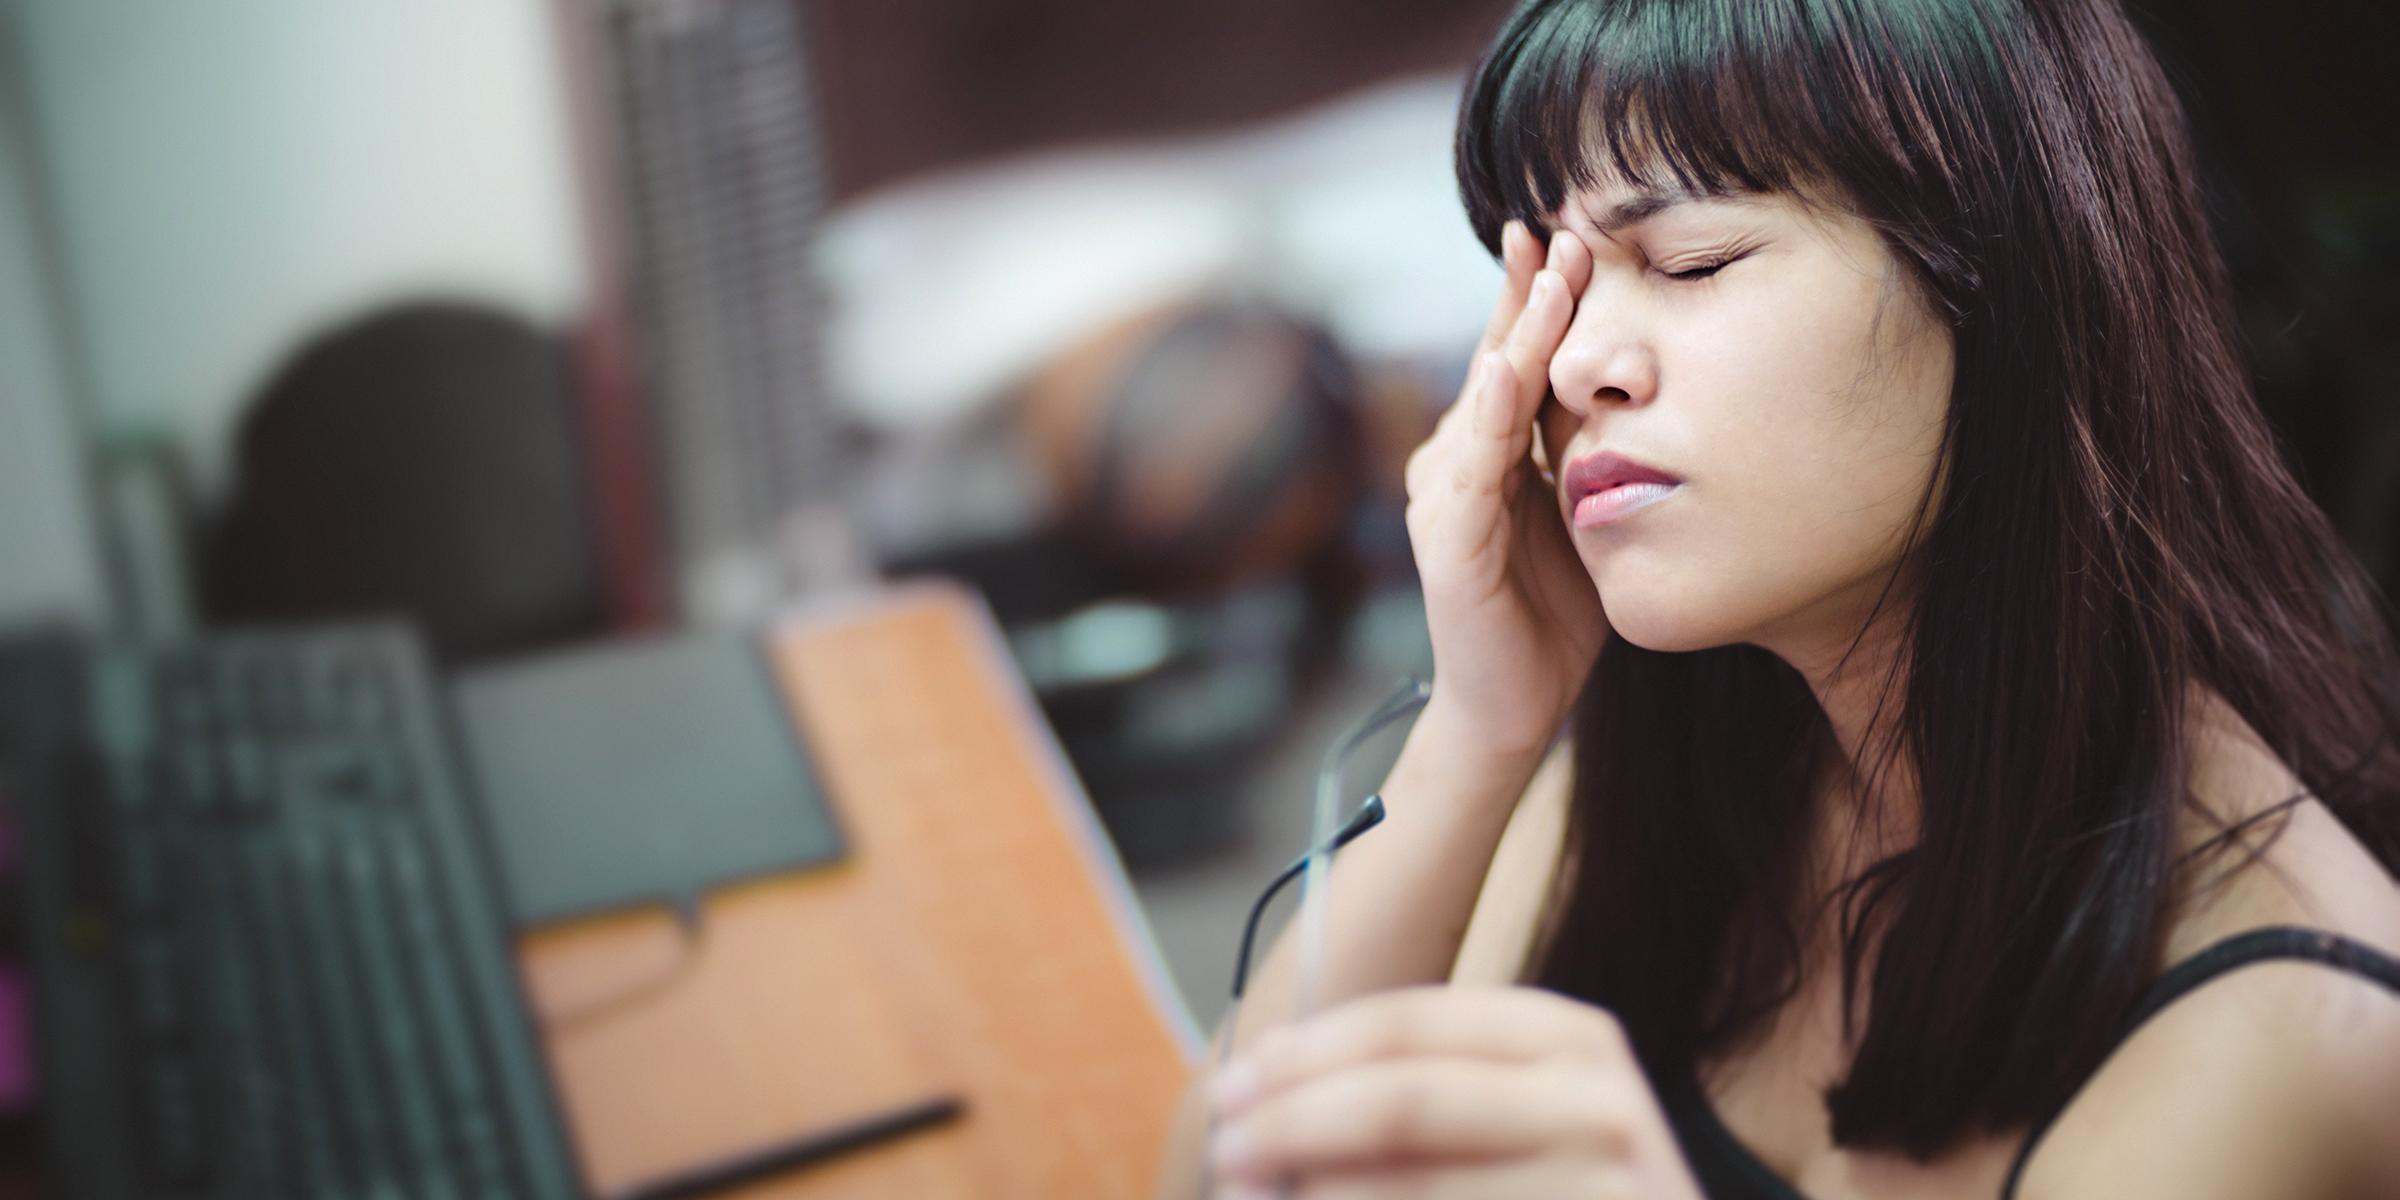 Eye problems in coronavirus quarantine include dry eyes, strain, blurry  vision